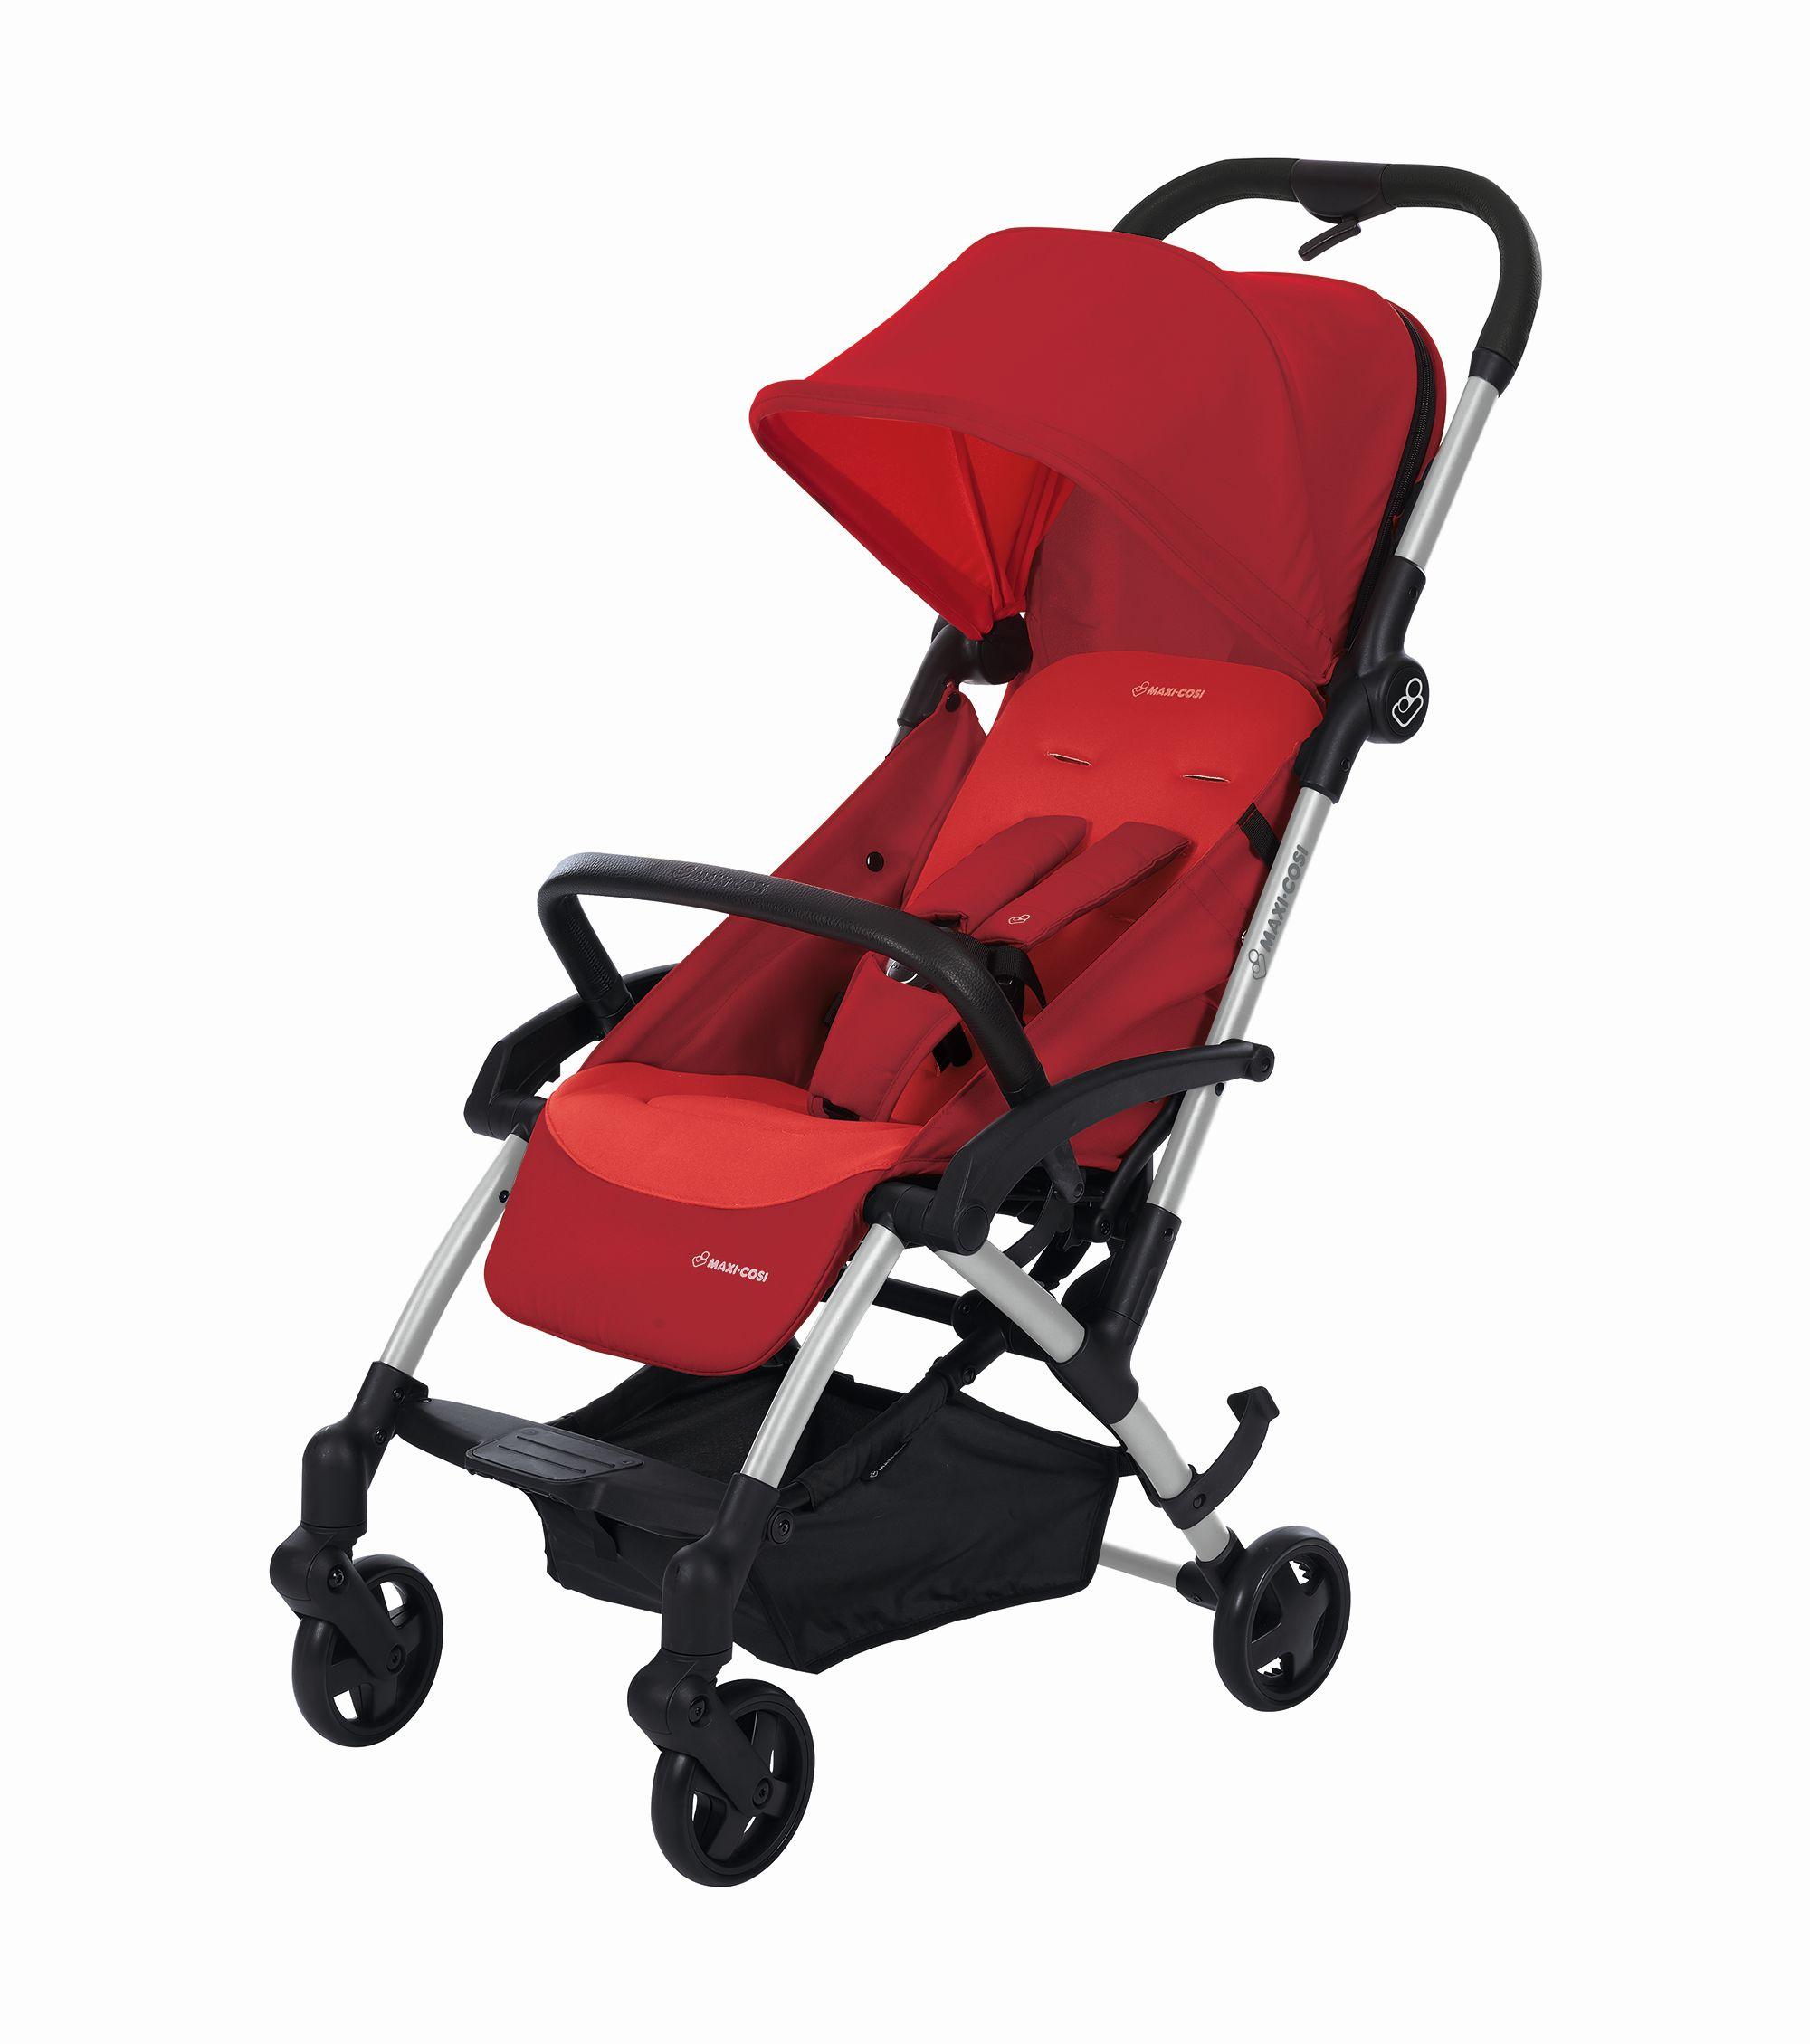 48241c798 Silla de Paseo Laika Maxi-Cosi 2019 Vivid Red - Comprar en kidsroom ...